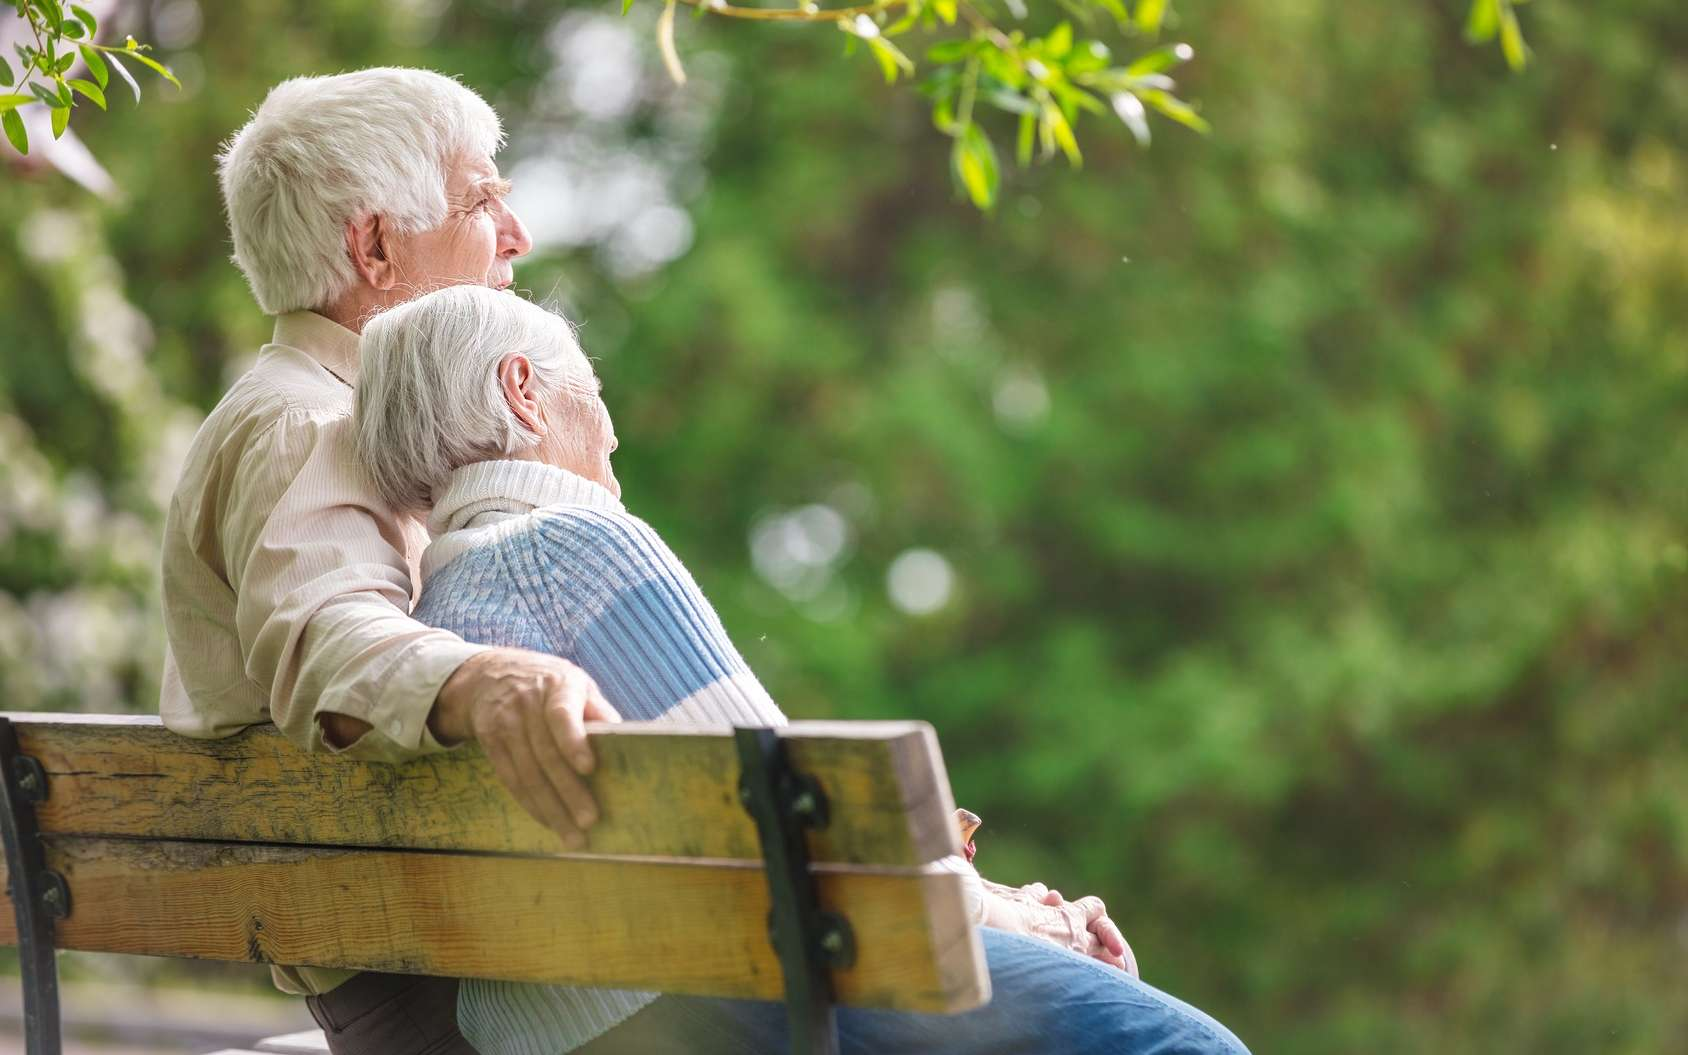 La population française vieillit. © Andrey Bandurenko, Fotolia